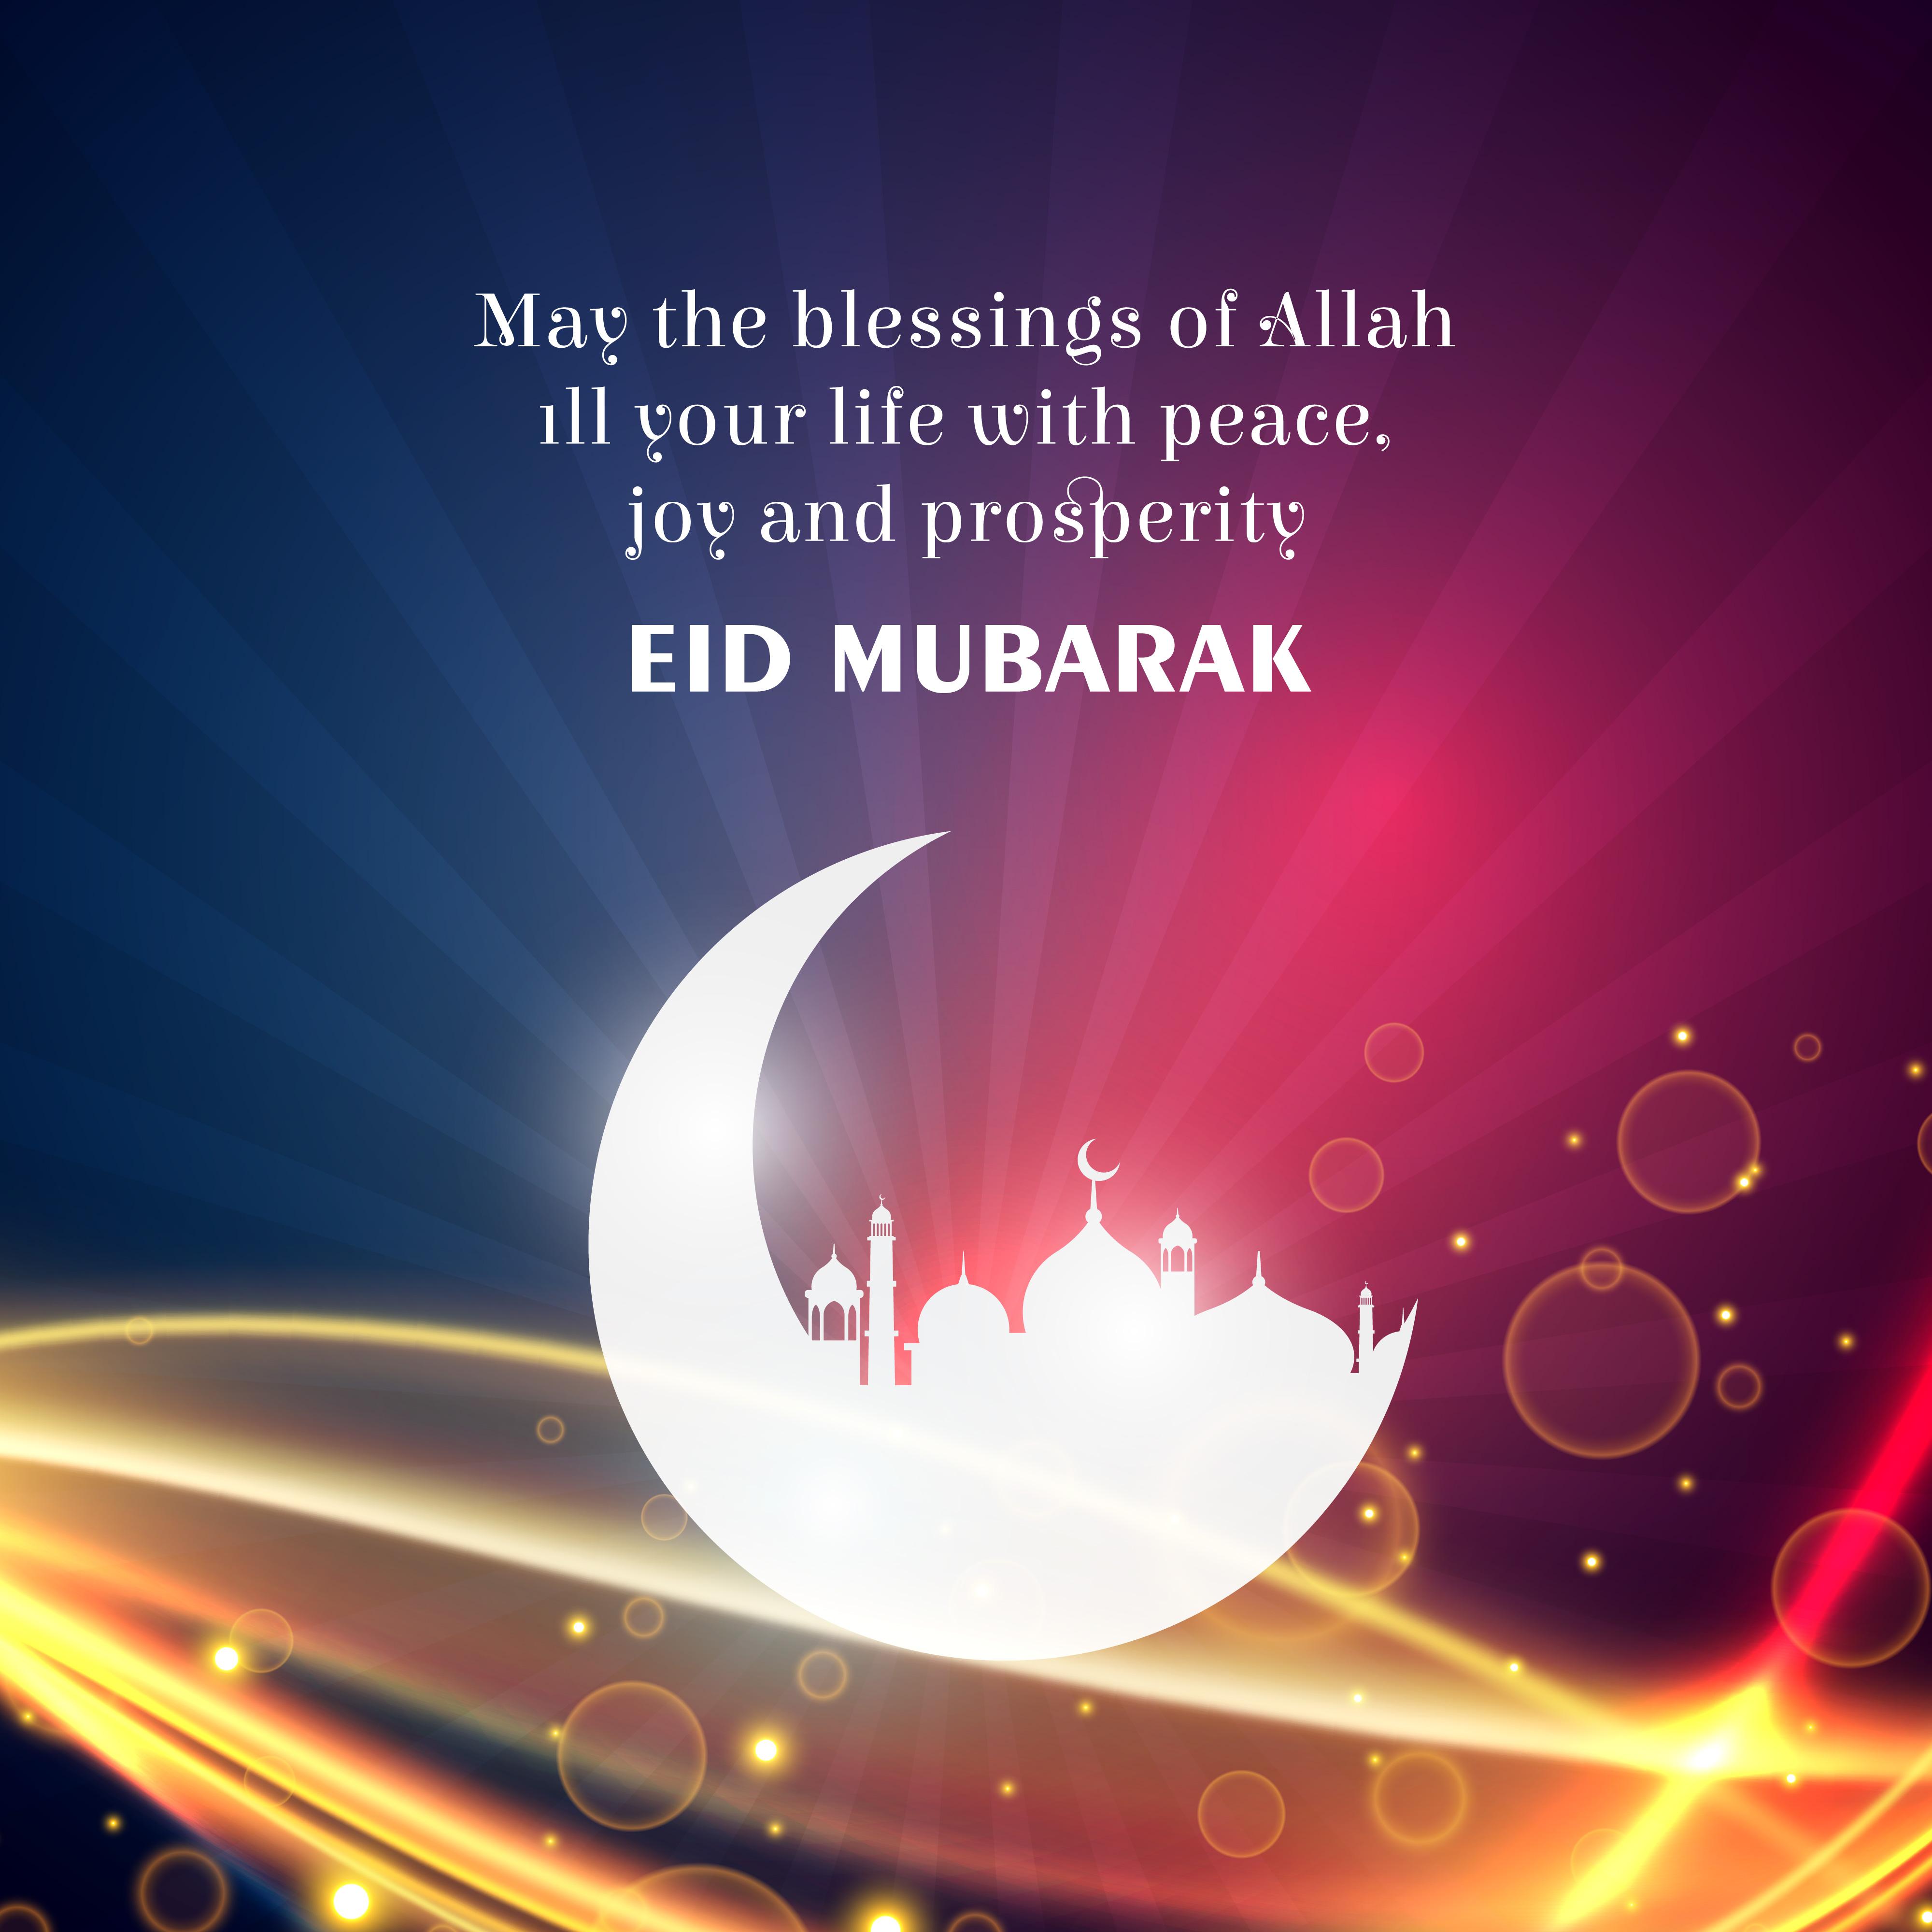 Eid Mubarak Wishes Greeting For Islamic Festival Download Free